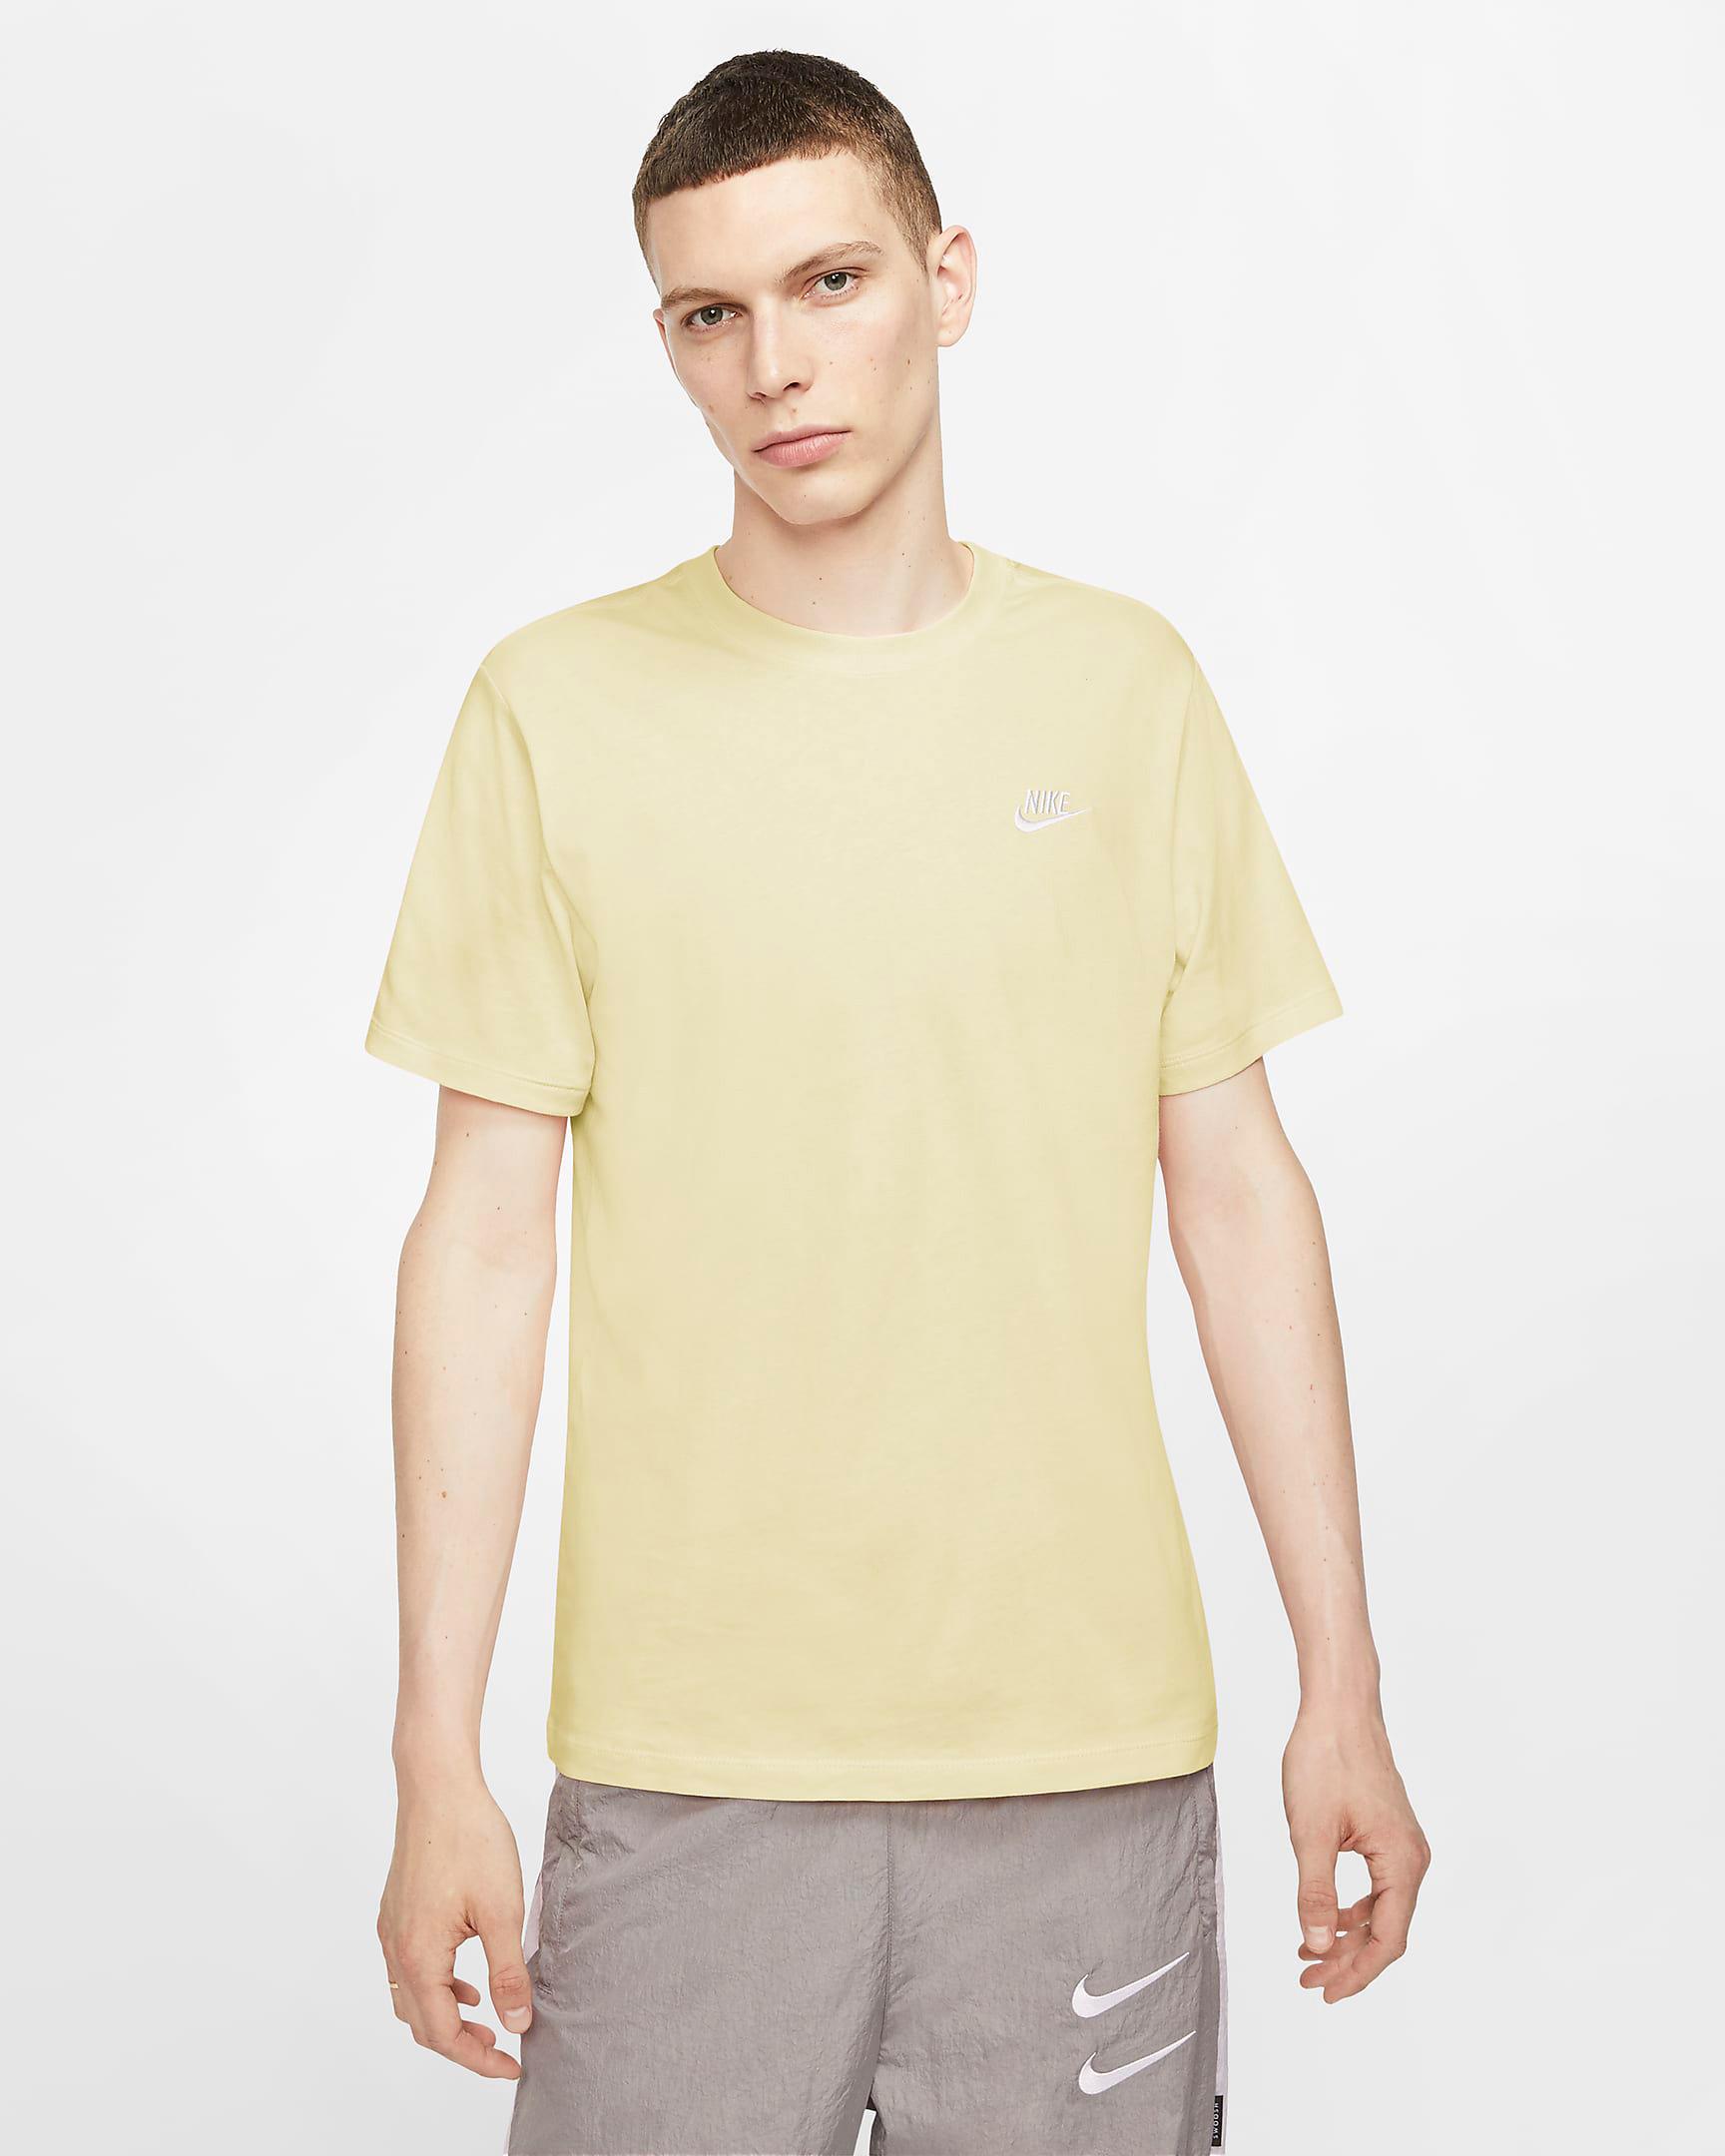 nike-coconut-milk-club-t-shirt